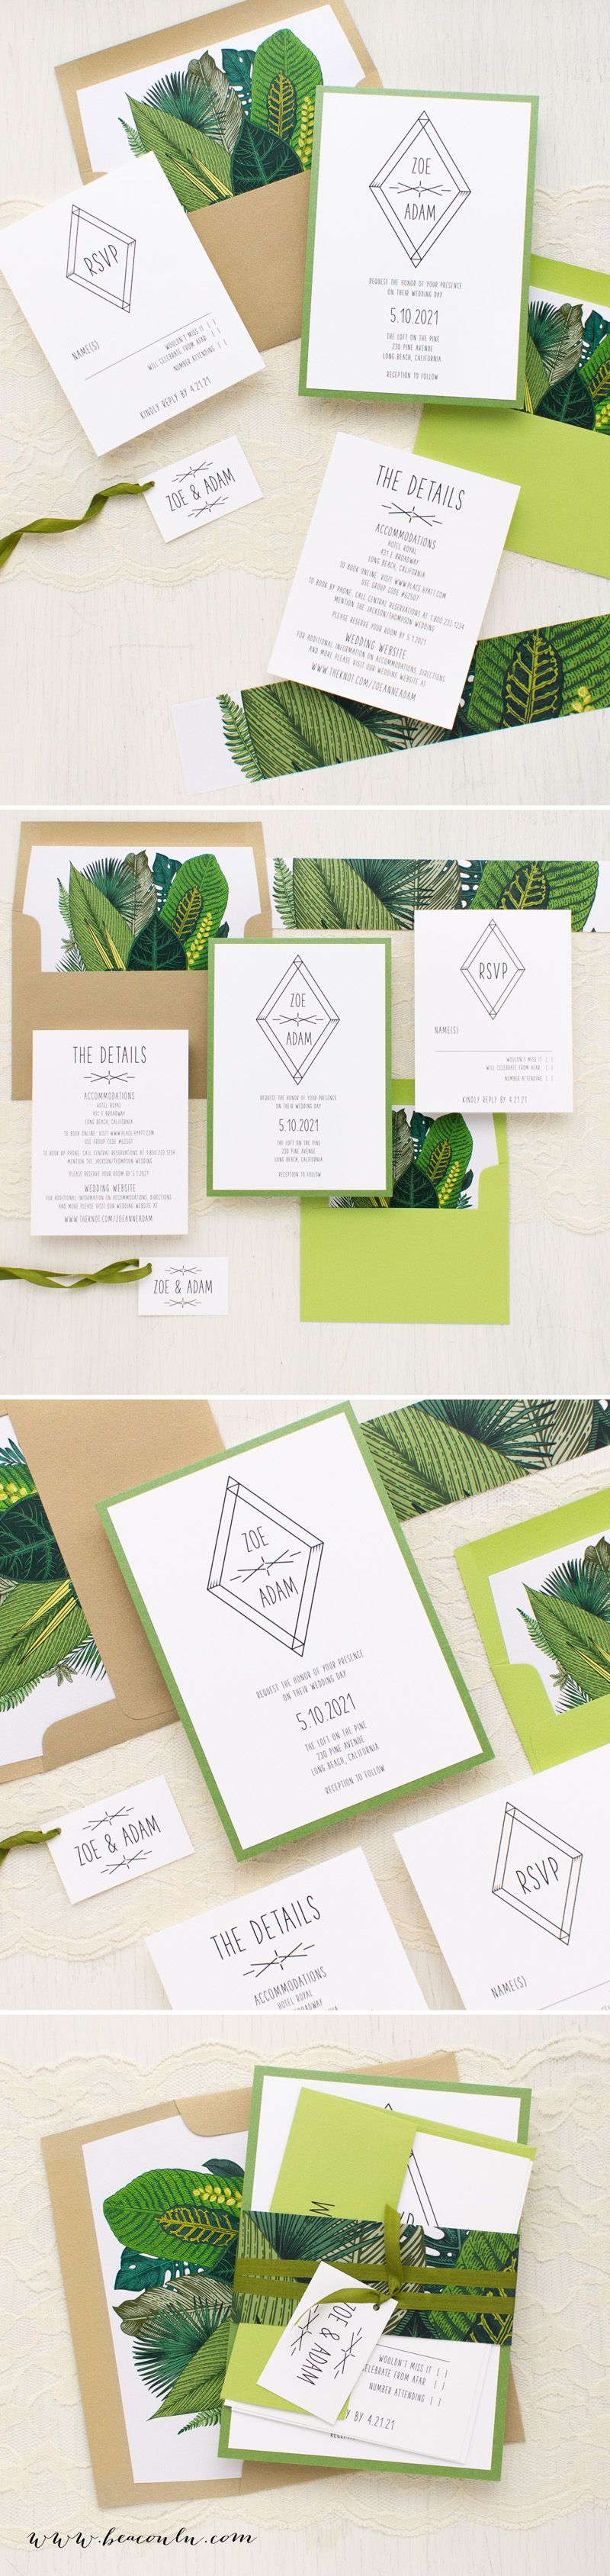 Green Leaf Wedding Invitations | Modern boho, White paper and Fonts